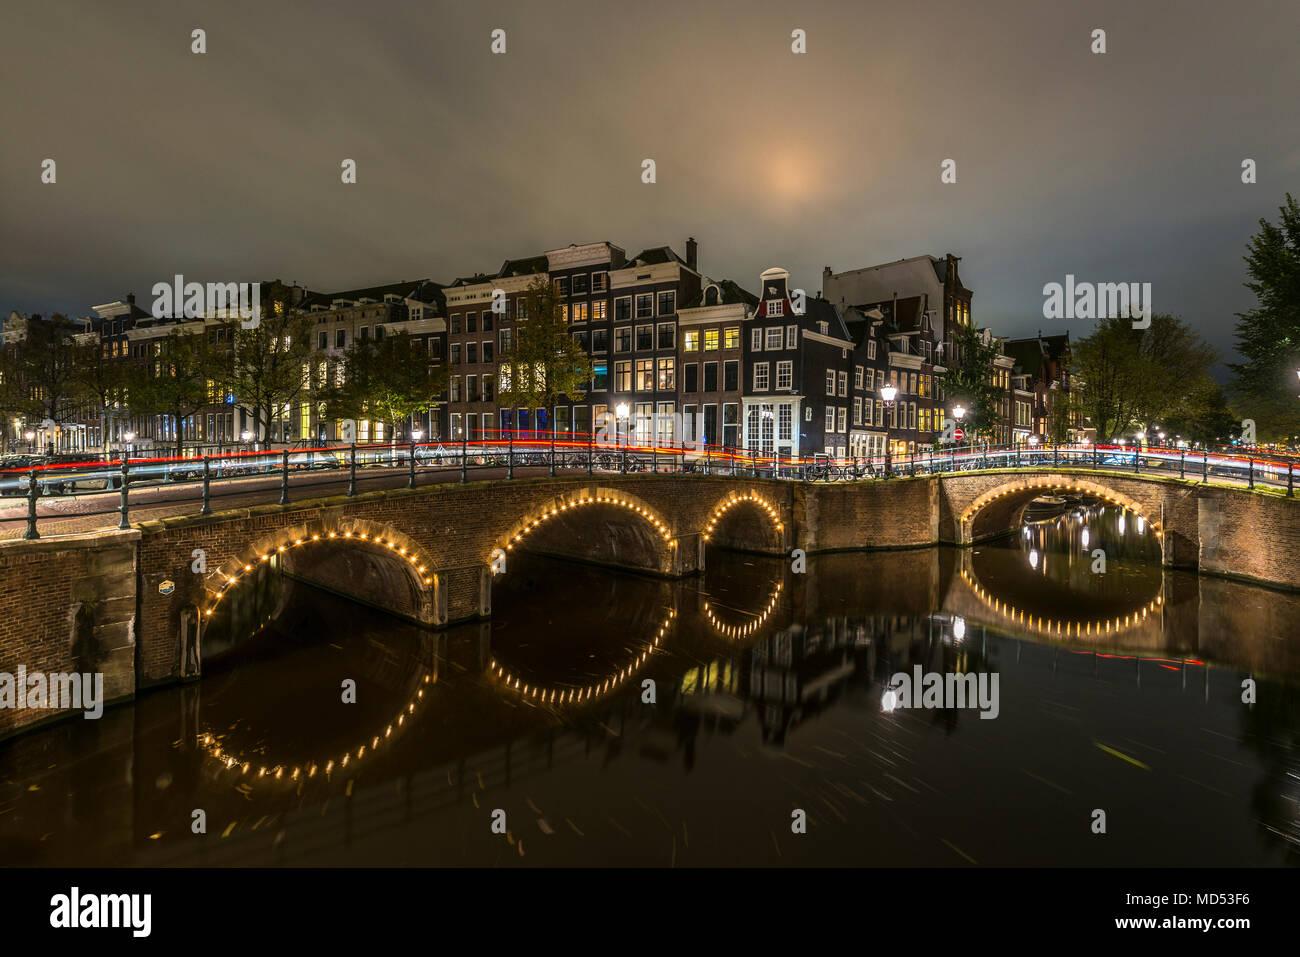 Prinsengracht at night, Amsterdam, Holland, Netherlands - Stock Image